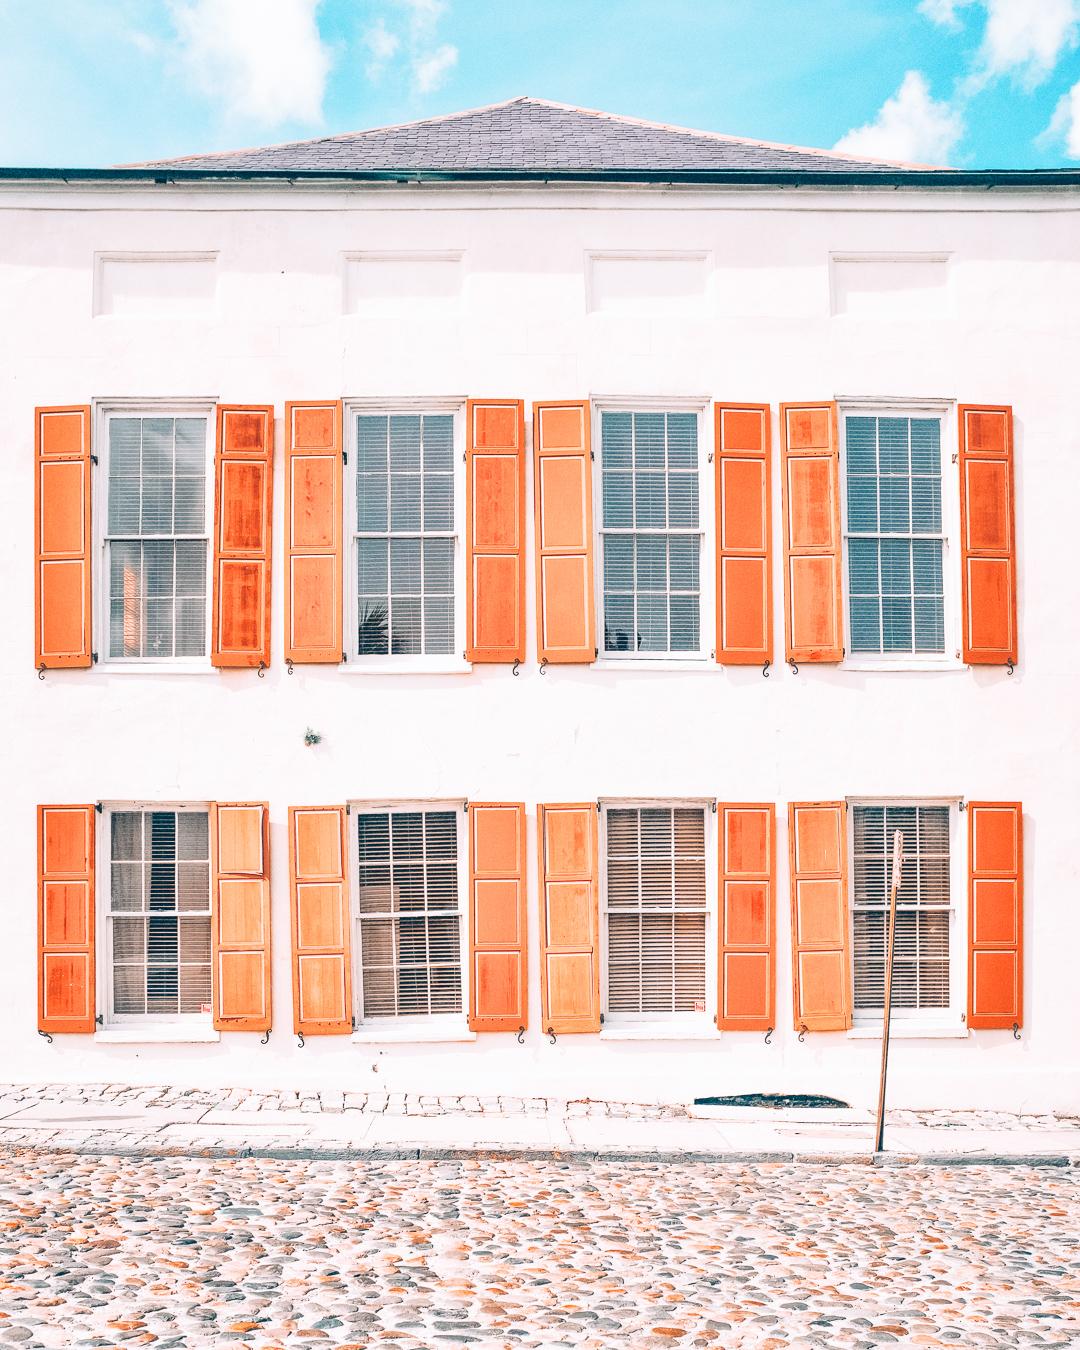 A white building with orange windows